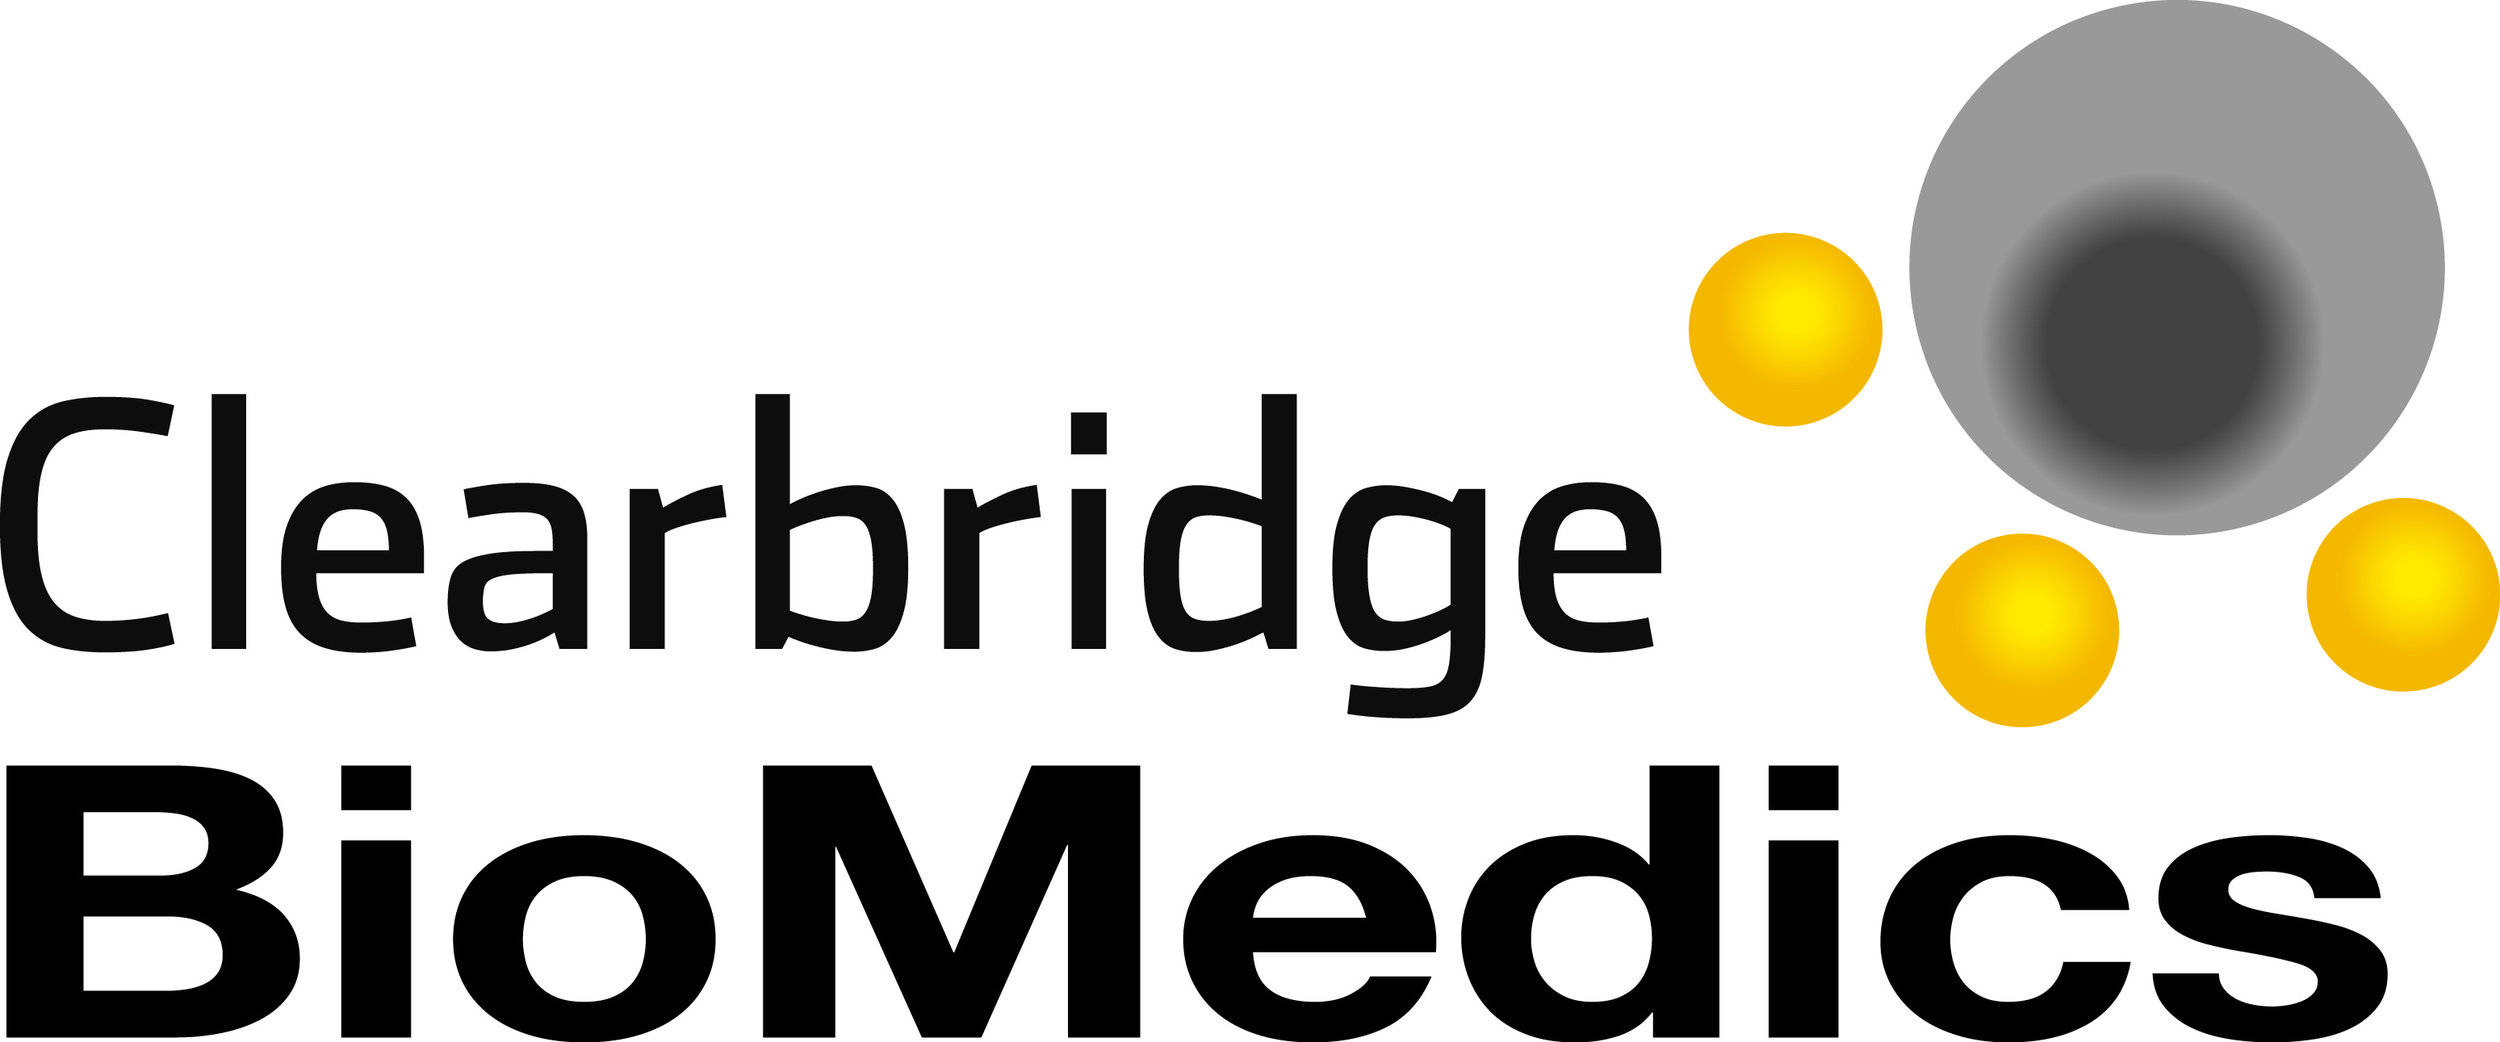 Clearbridge Biomedics.jpg